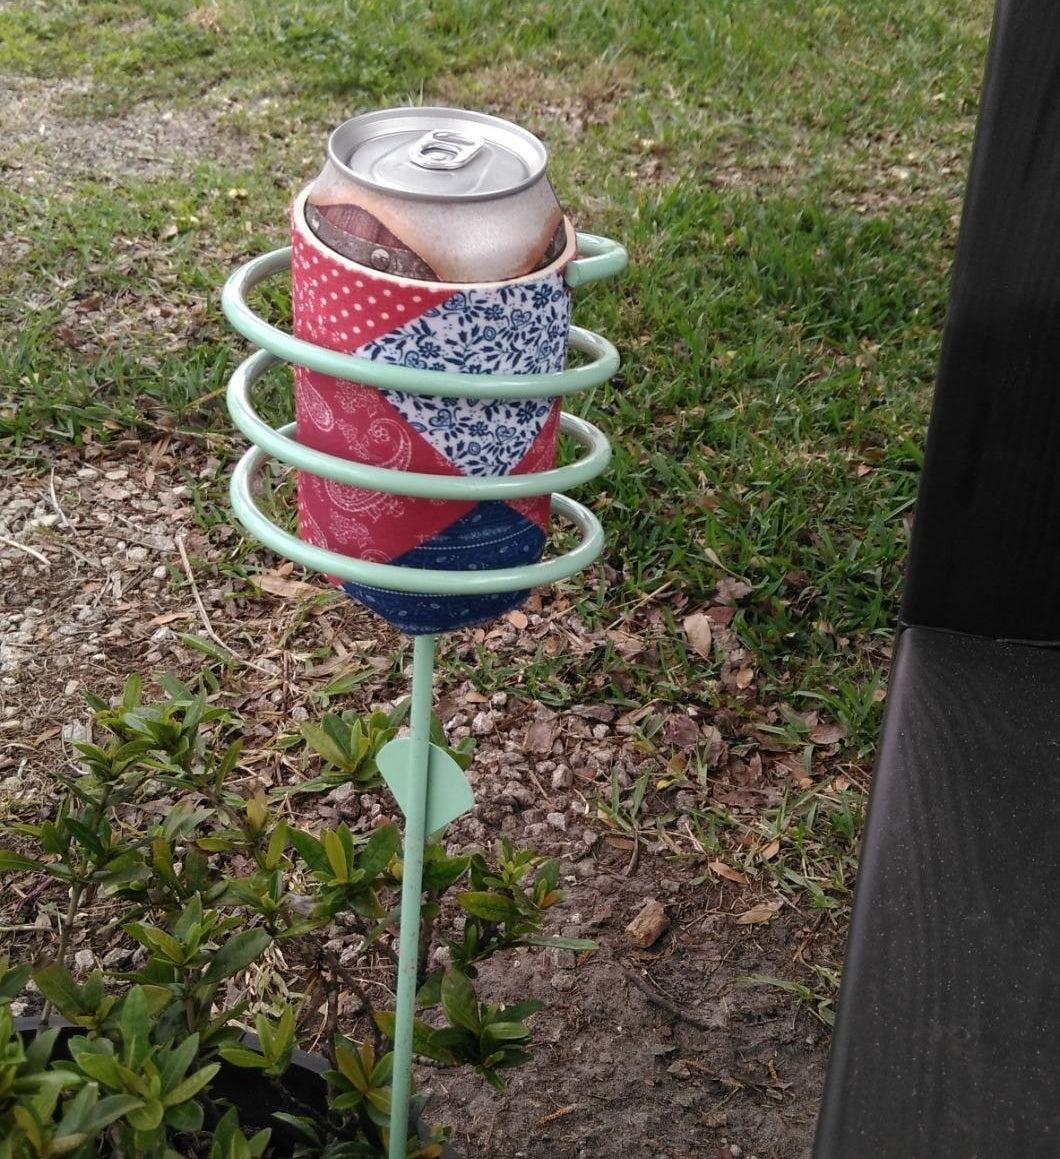 The drink holder